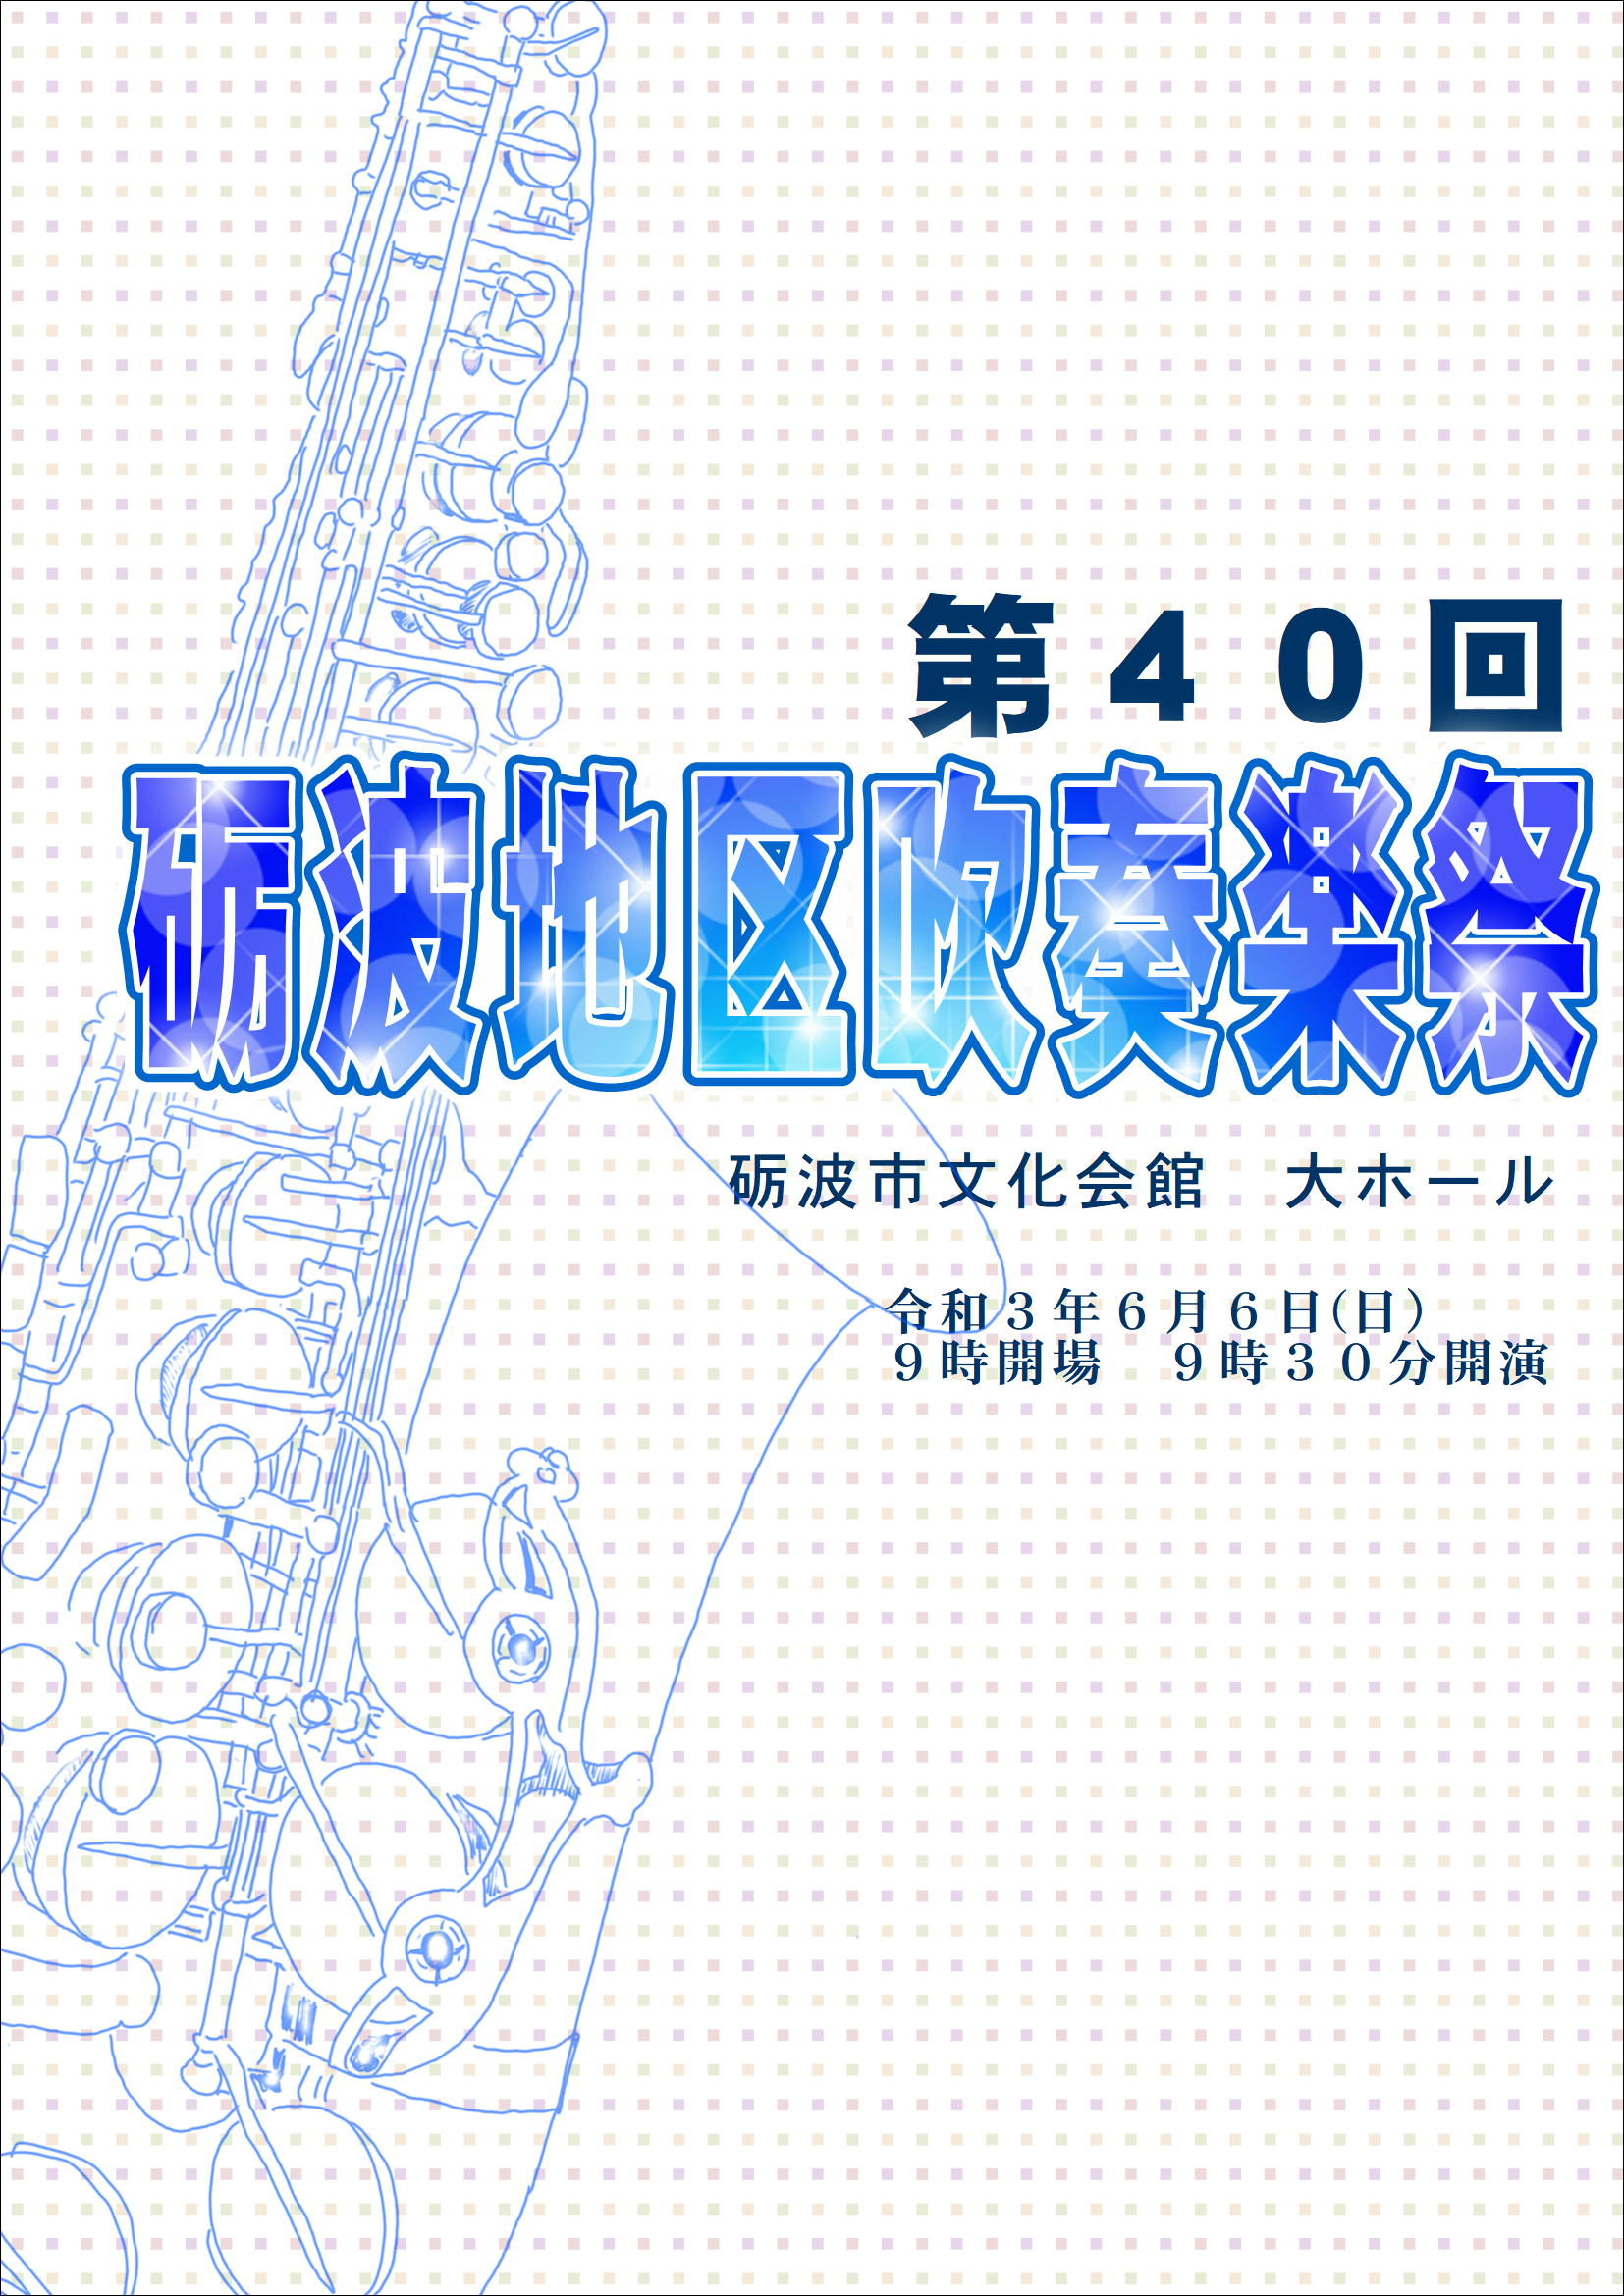 BLUOOM X SEP 2020 organized by KAJIMOTO #1 New Generations & Super Brass Stars